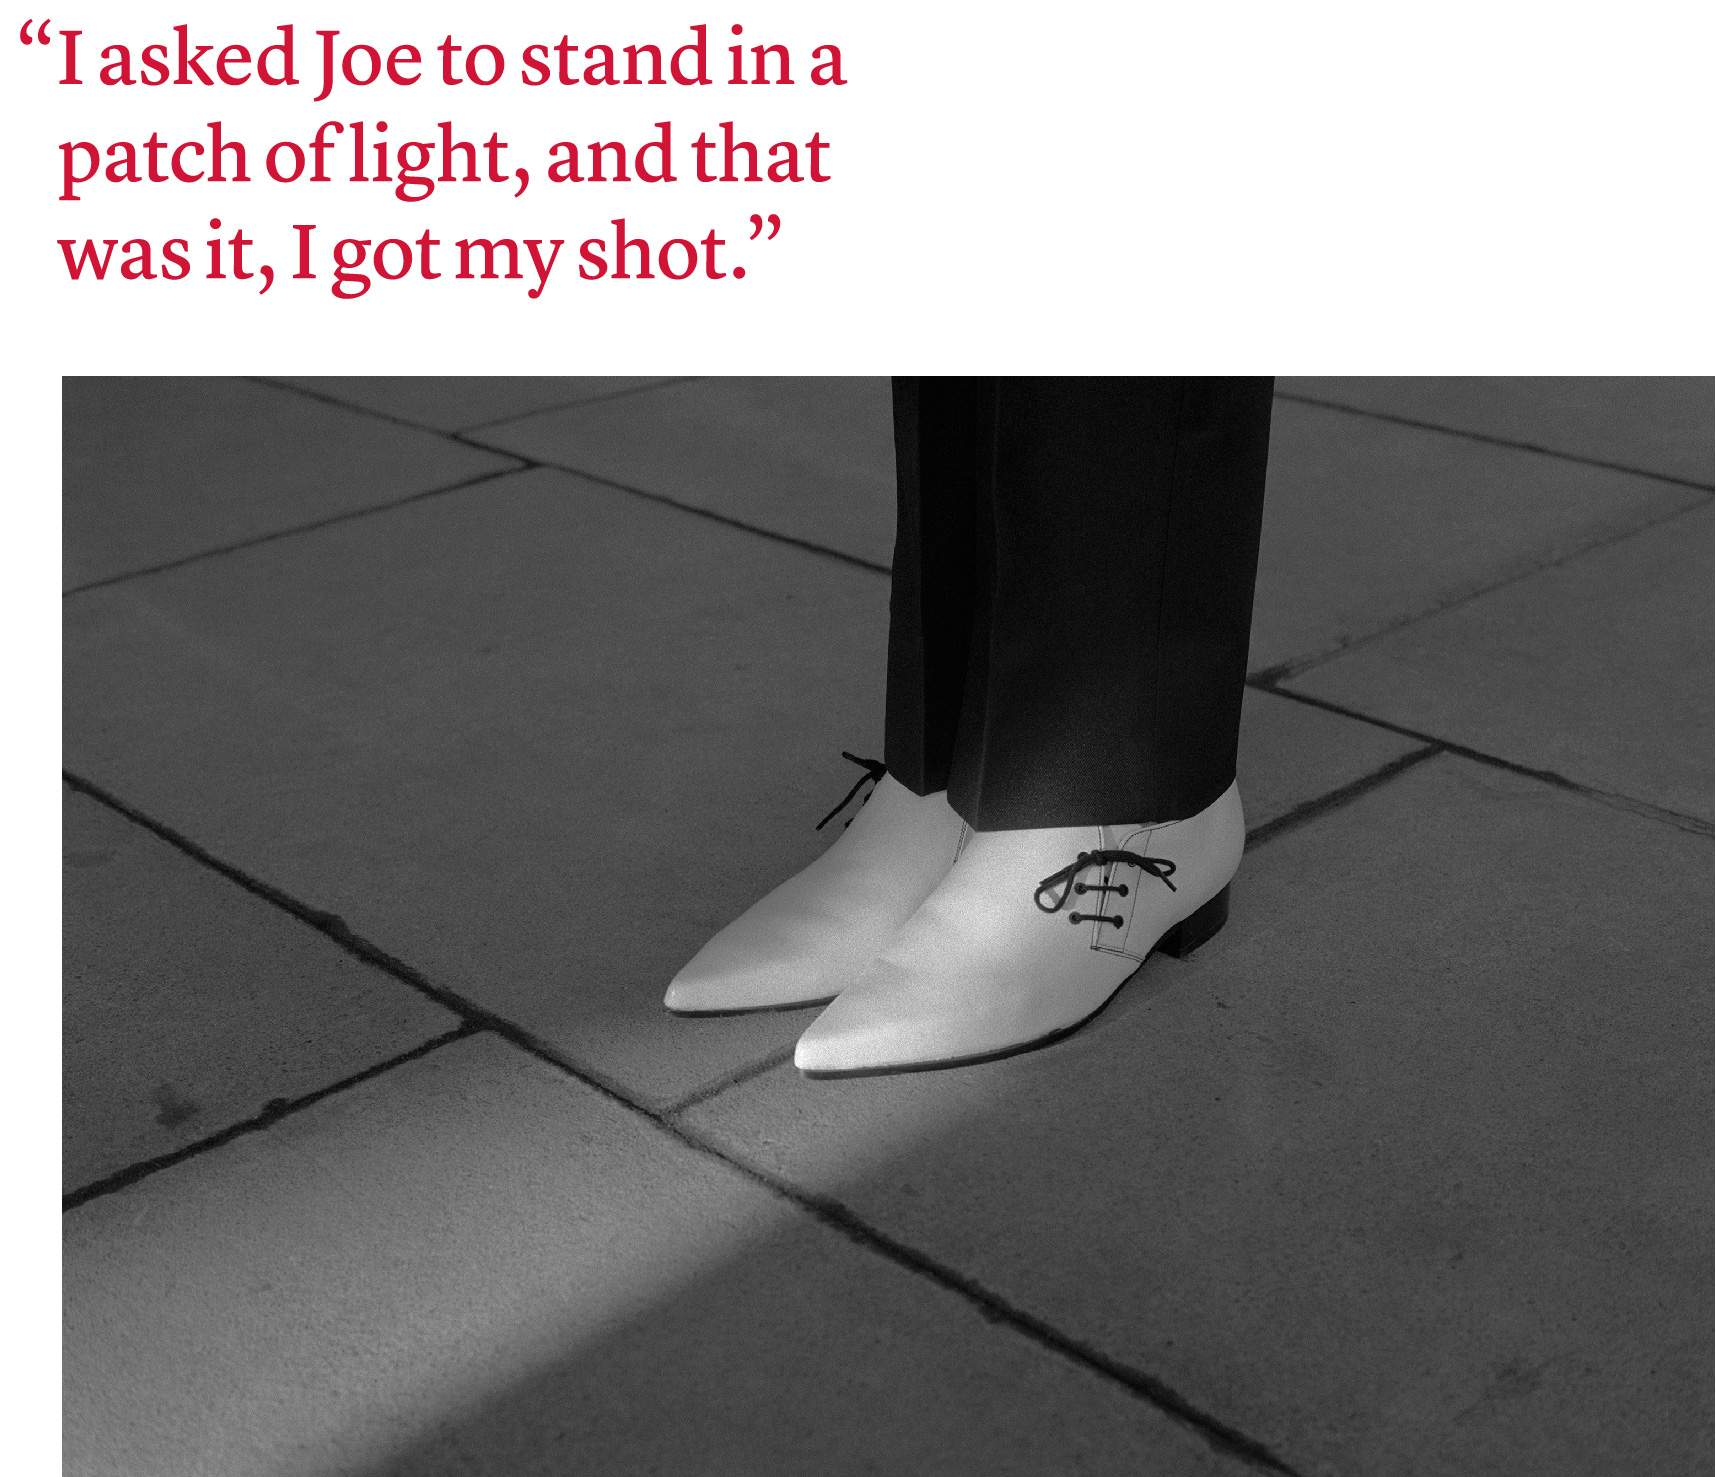 Joe Jackson, (Musician), Look Sharp! album cover, London, England, 1979